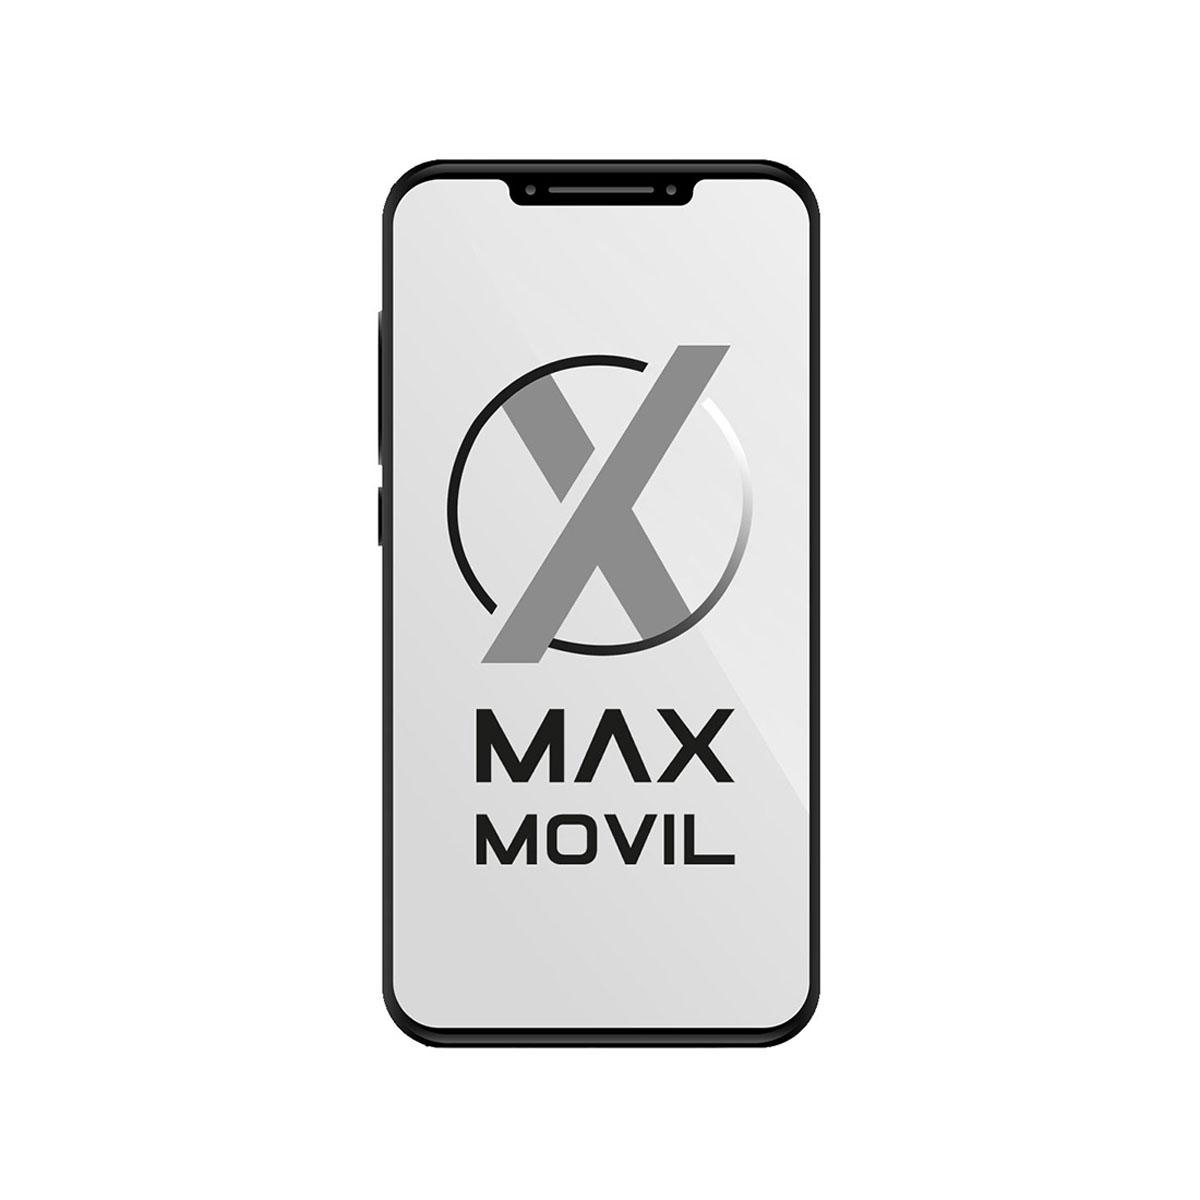 Funda móvil colgante con cuerda para iPhone SE 2020 / 8 / 7 silicona premium Verde